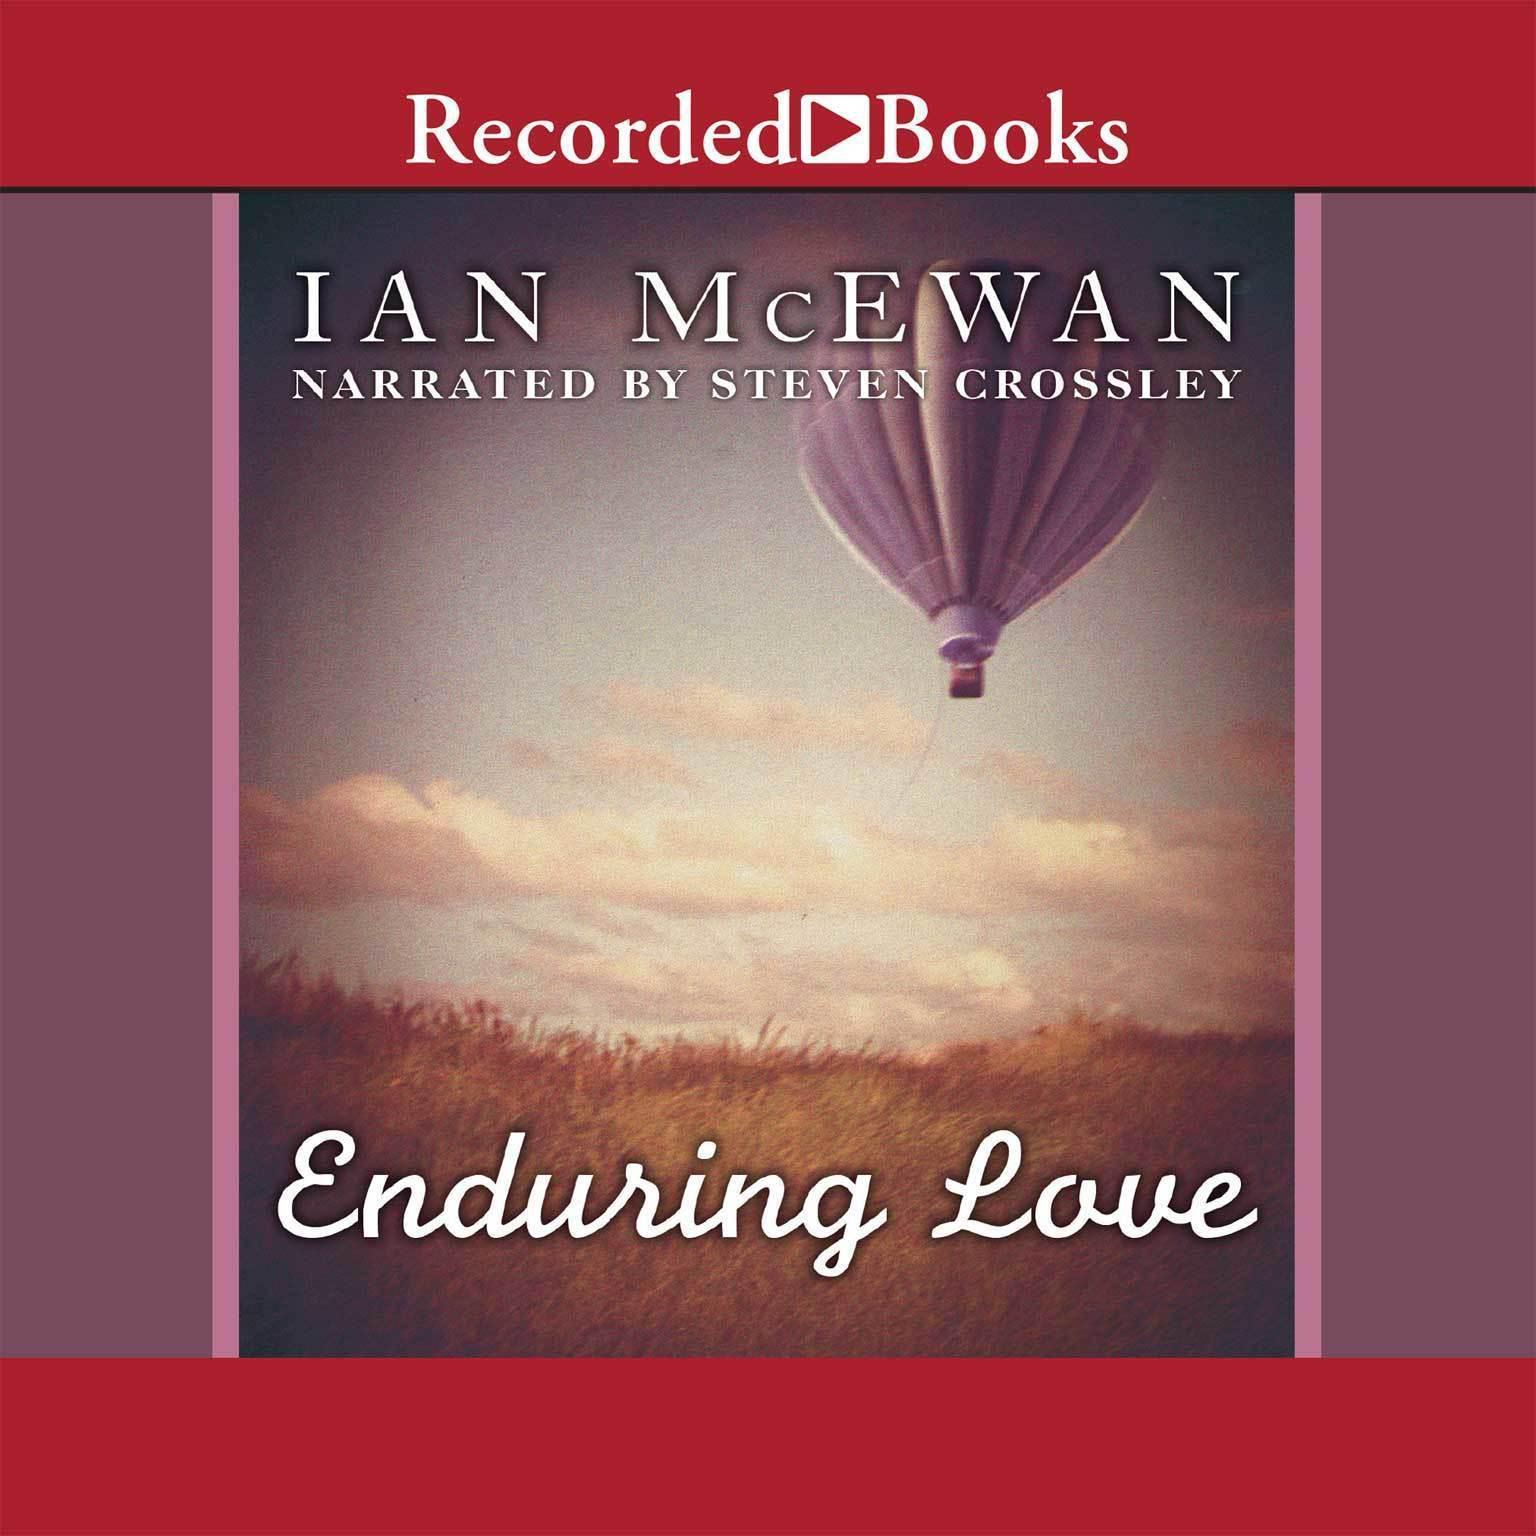 Enduring Love: A Novel Audiobook, by Ian McEwan